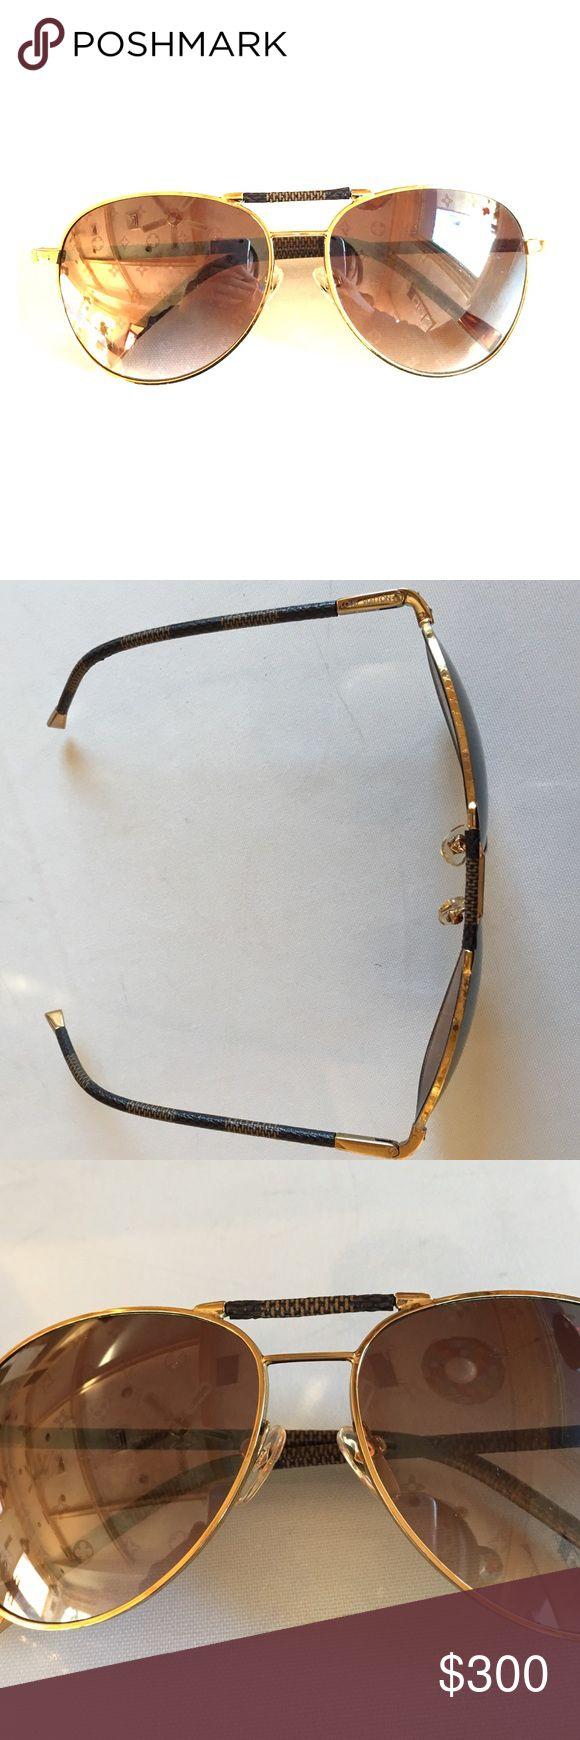 LV style millionaire sunglasses Excellent quality sunglasses. LV inspired. Good condition. Unisex. Original one is about $3k Louis Vuitton Accessories Sunglasses